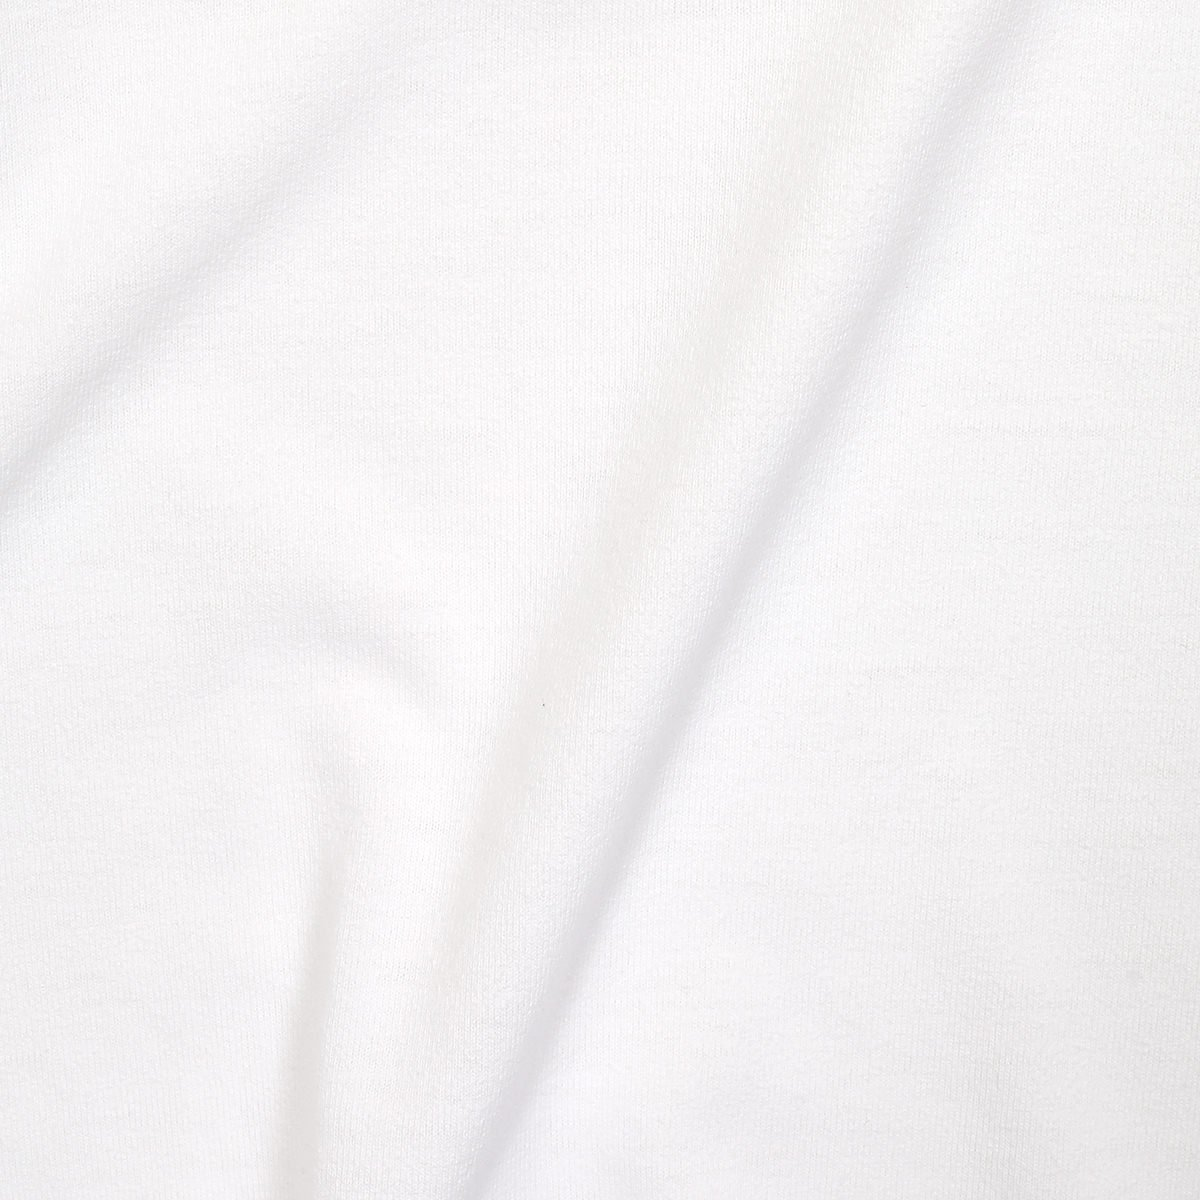 Short Sleeve RIB T-shirts 詳細画像22